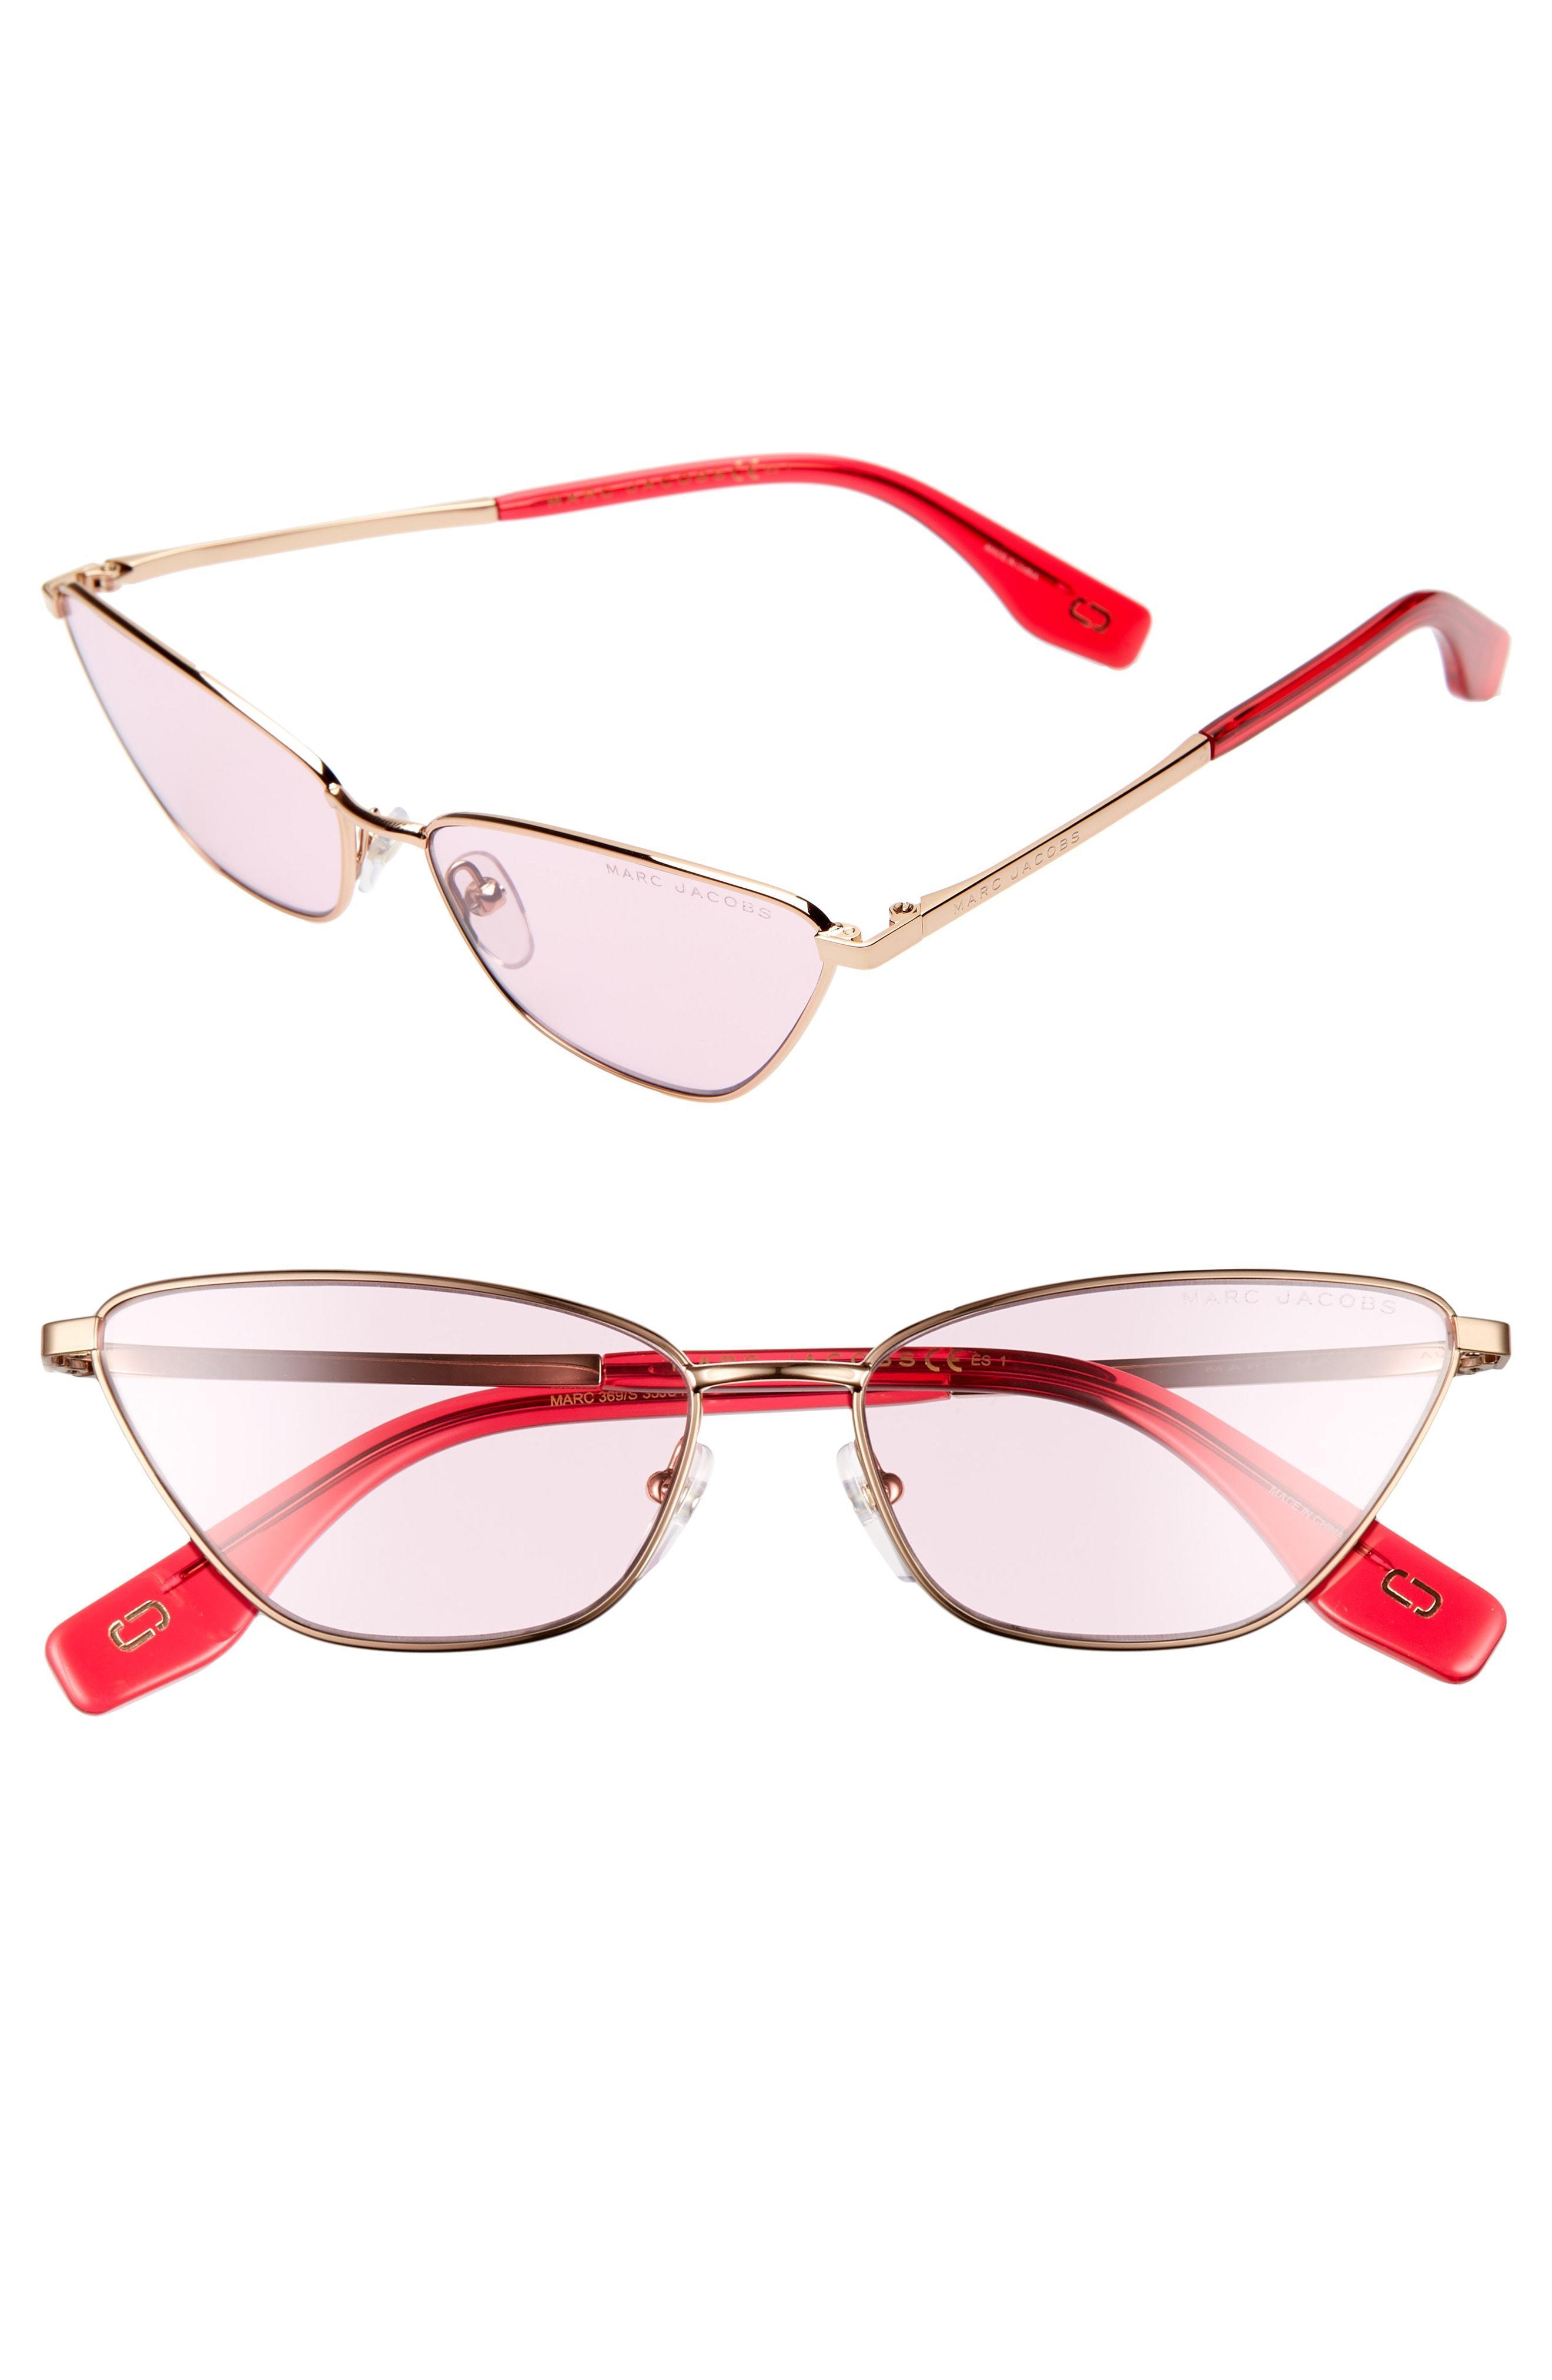 4e4ee32c0657 Marc Jacobs - Pink 57mm Cat Eye Sunglasses - - Lyst. View fullscreen